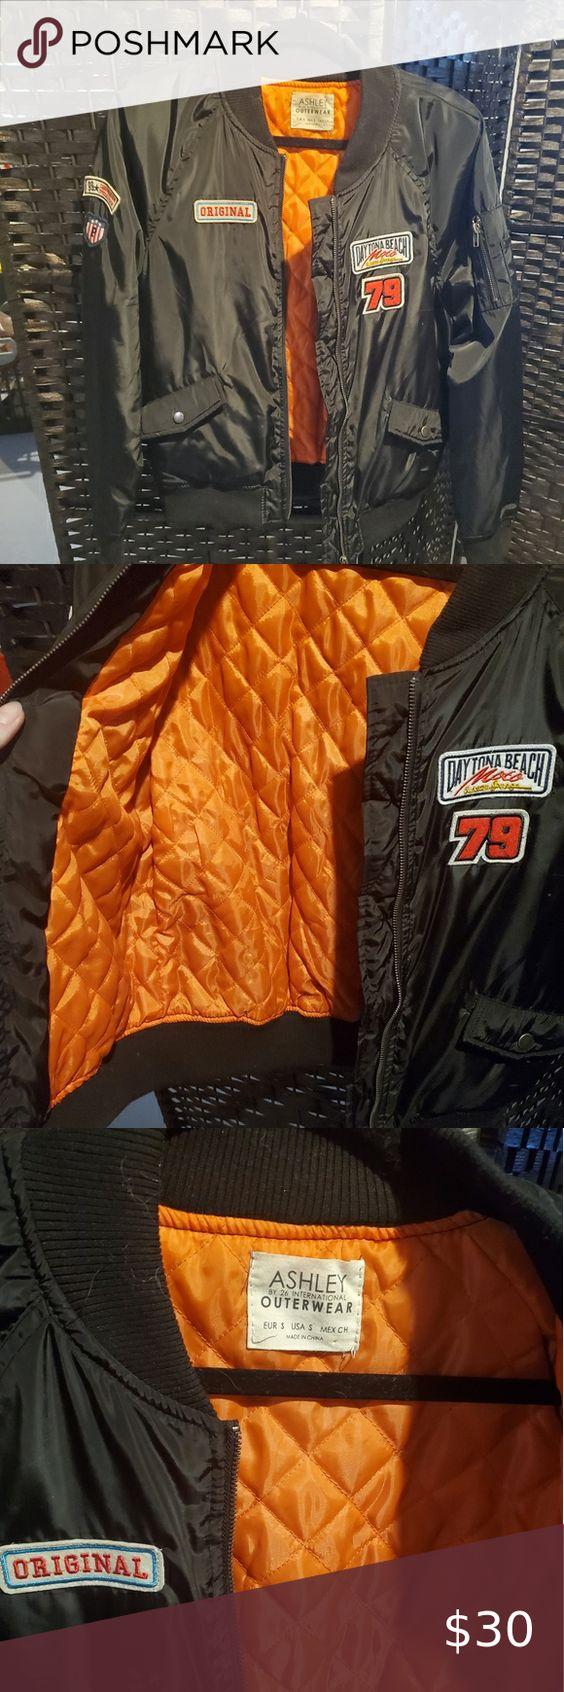 Ashley Outerwear Daytona Beach Black Coat Outerwear Black Coat Stylish Coat [ 1692 x 564 Pixel ]